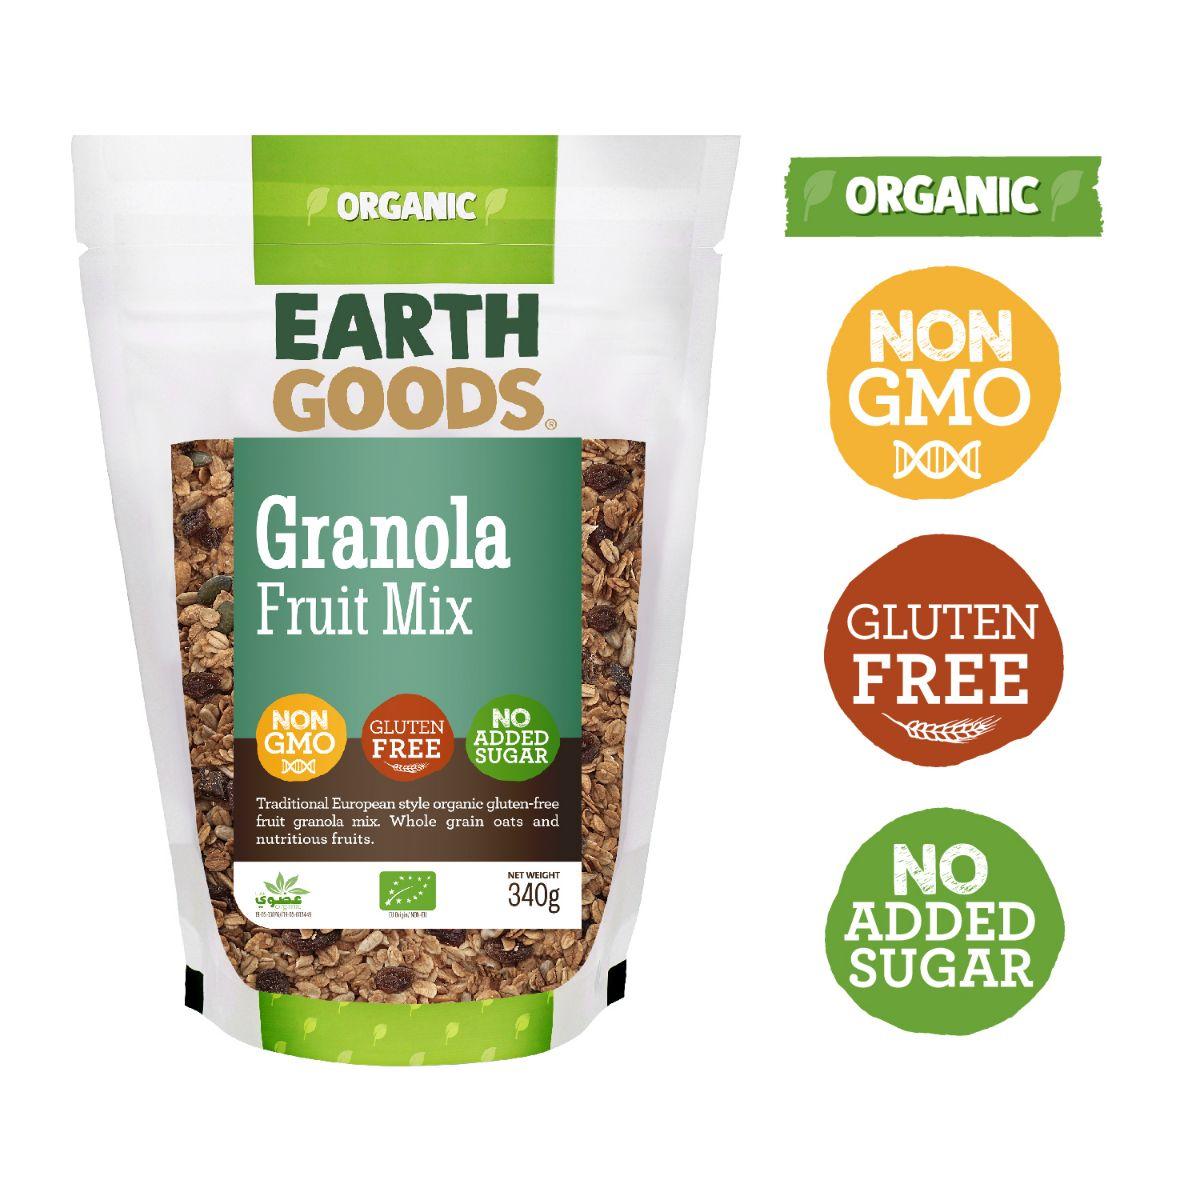 Earth Goods Organic GF Fruit Mix Granola - 340g